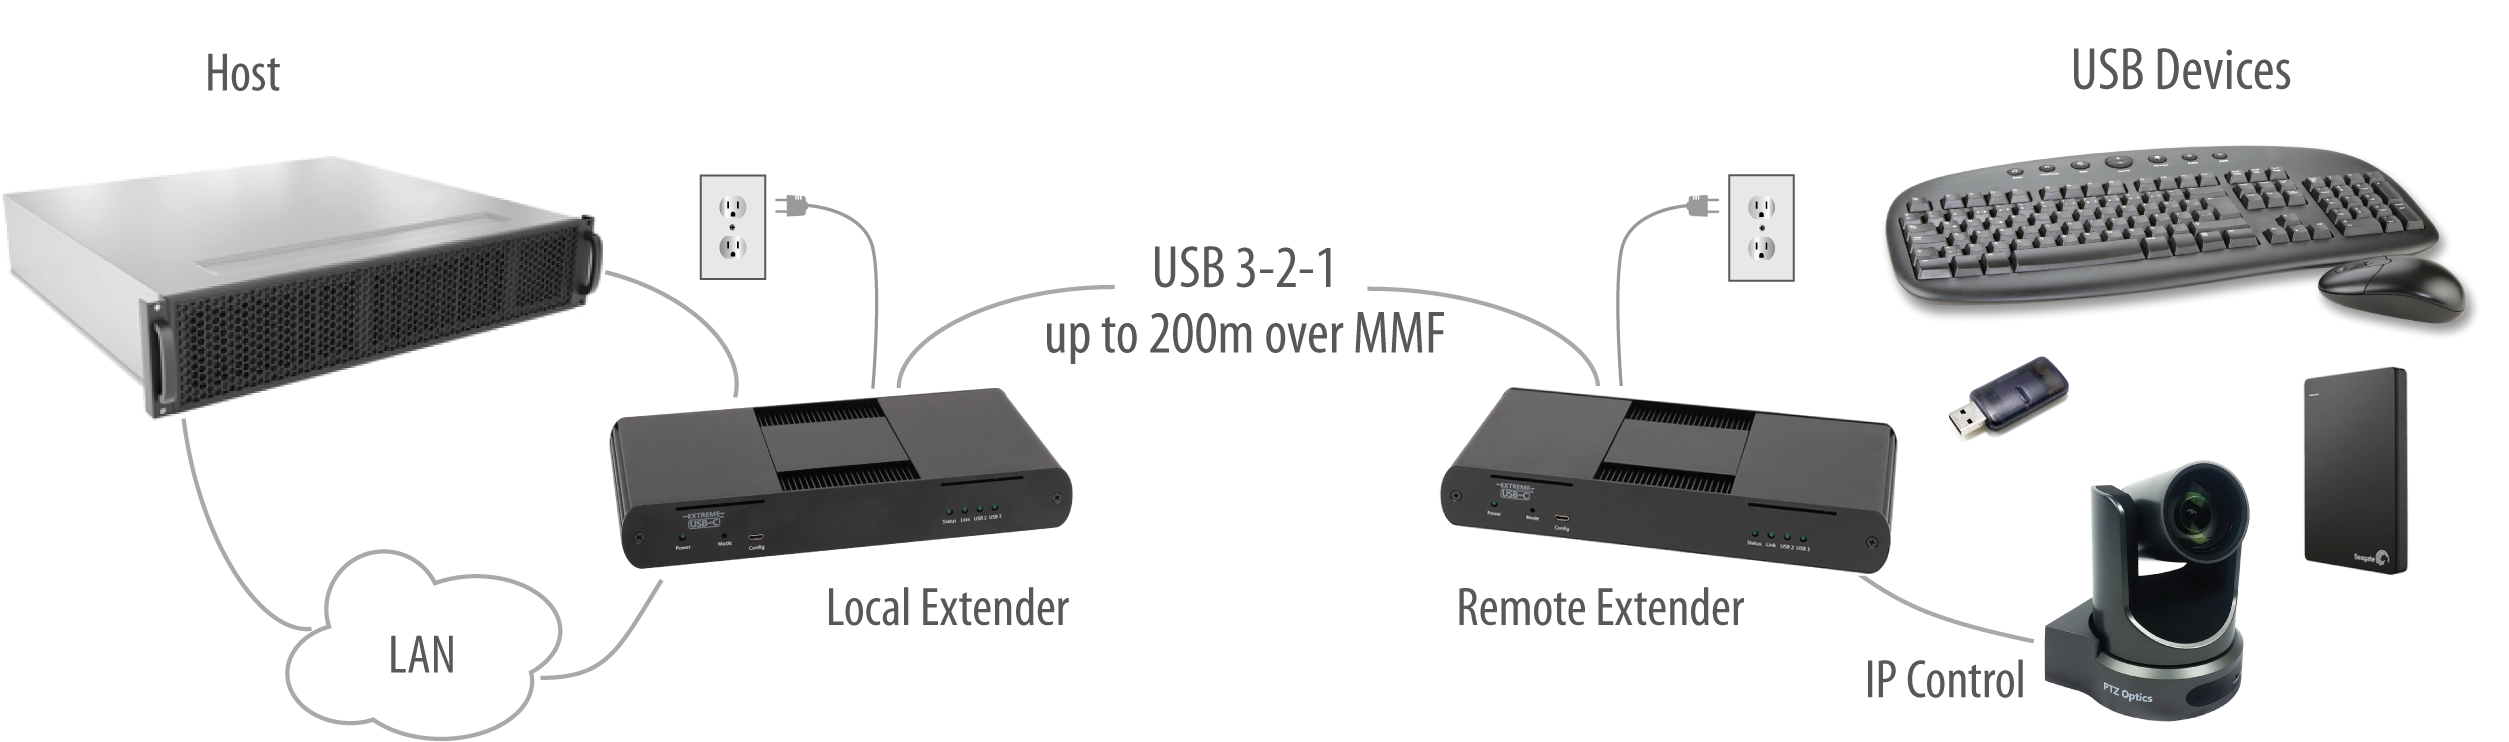 USB 3-2-1 Raven 3124 200m MMF Fiber Point-to-Point Extender System Application Diagram